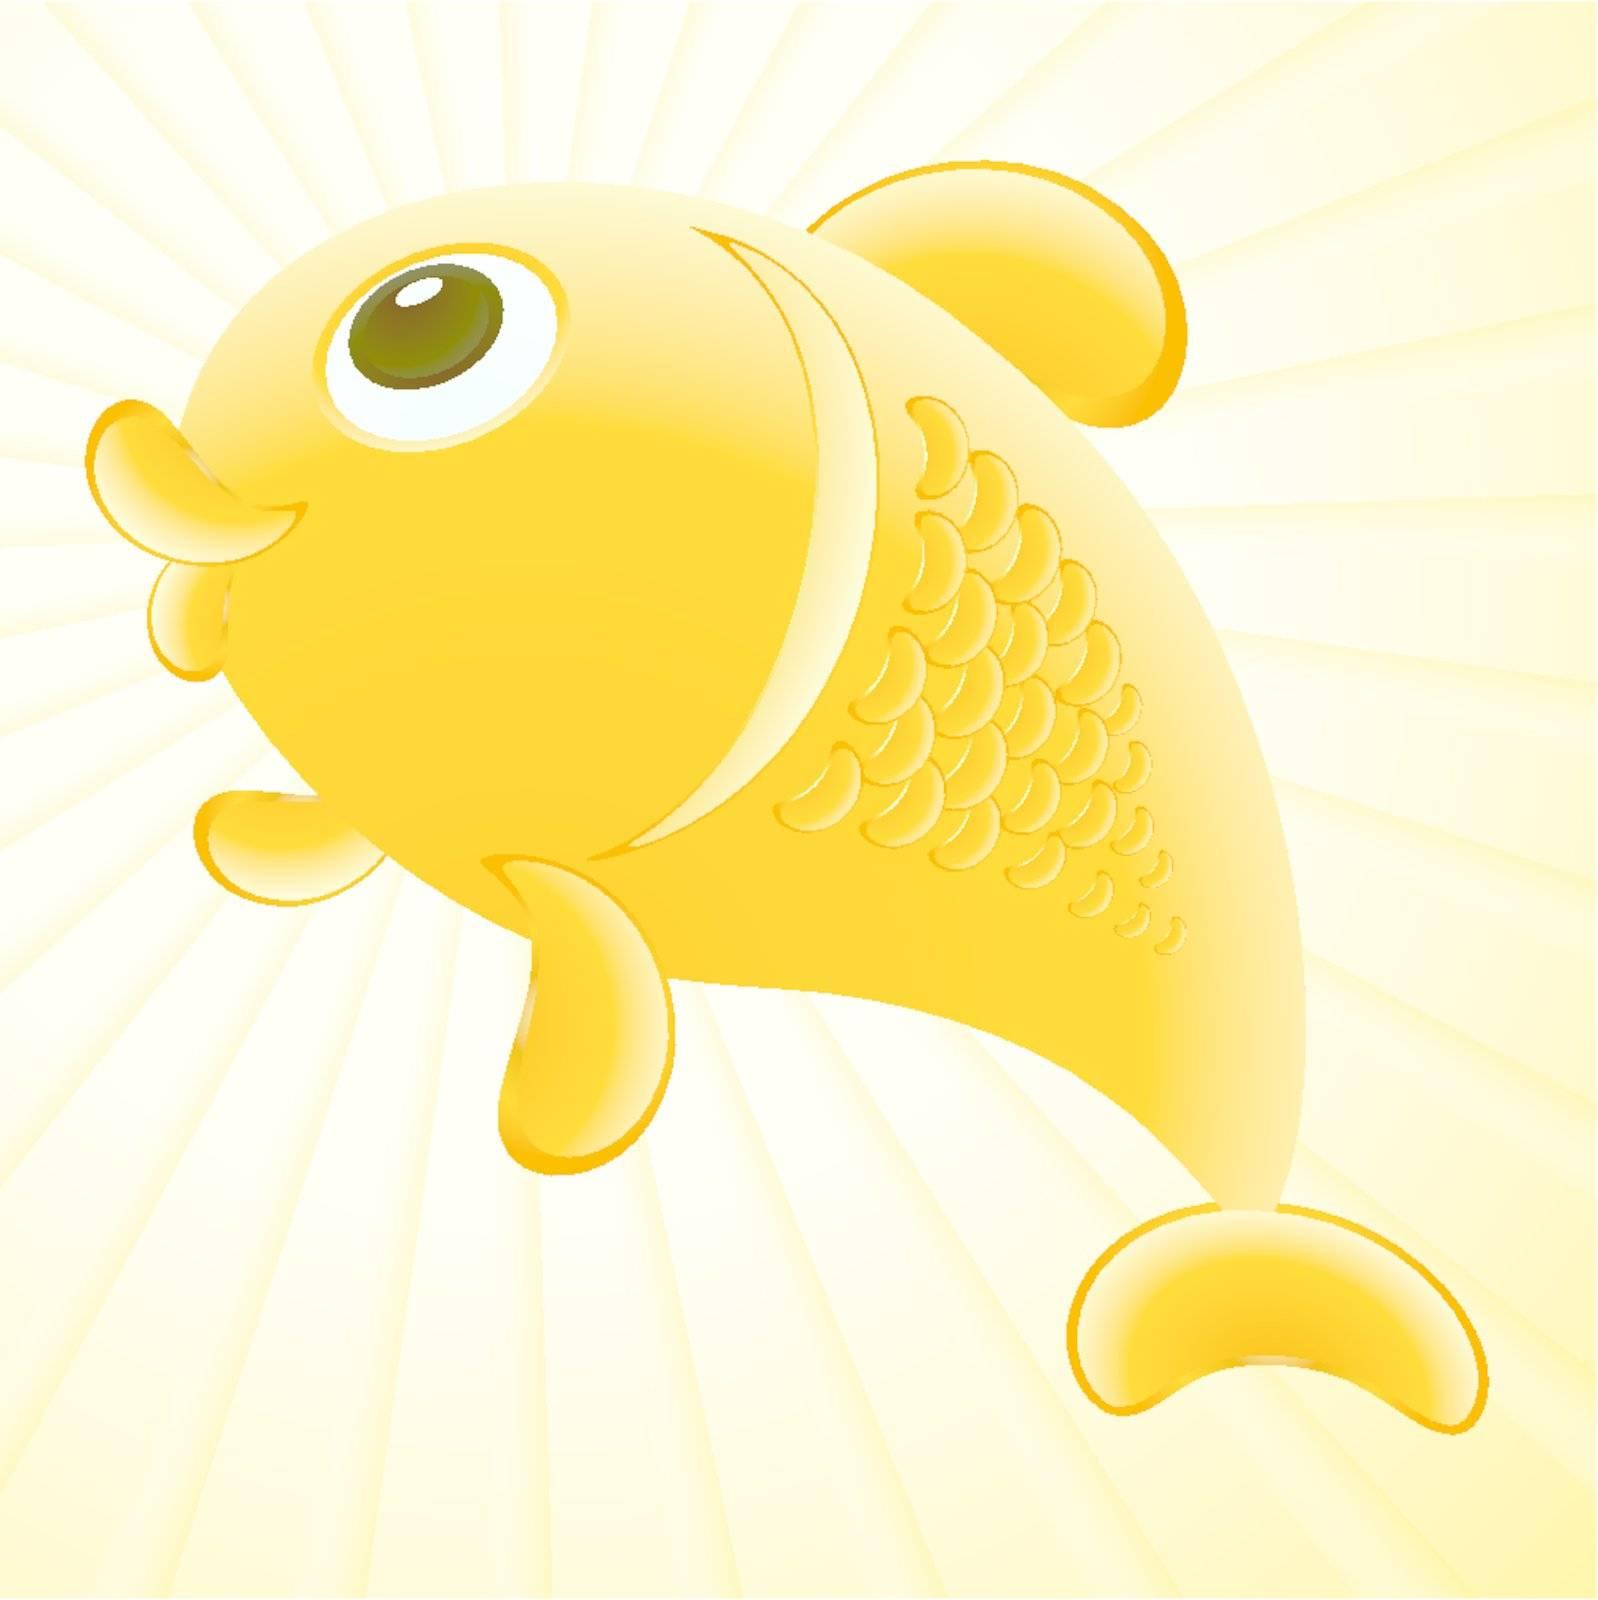 Abstract golden fish illustration